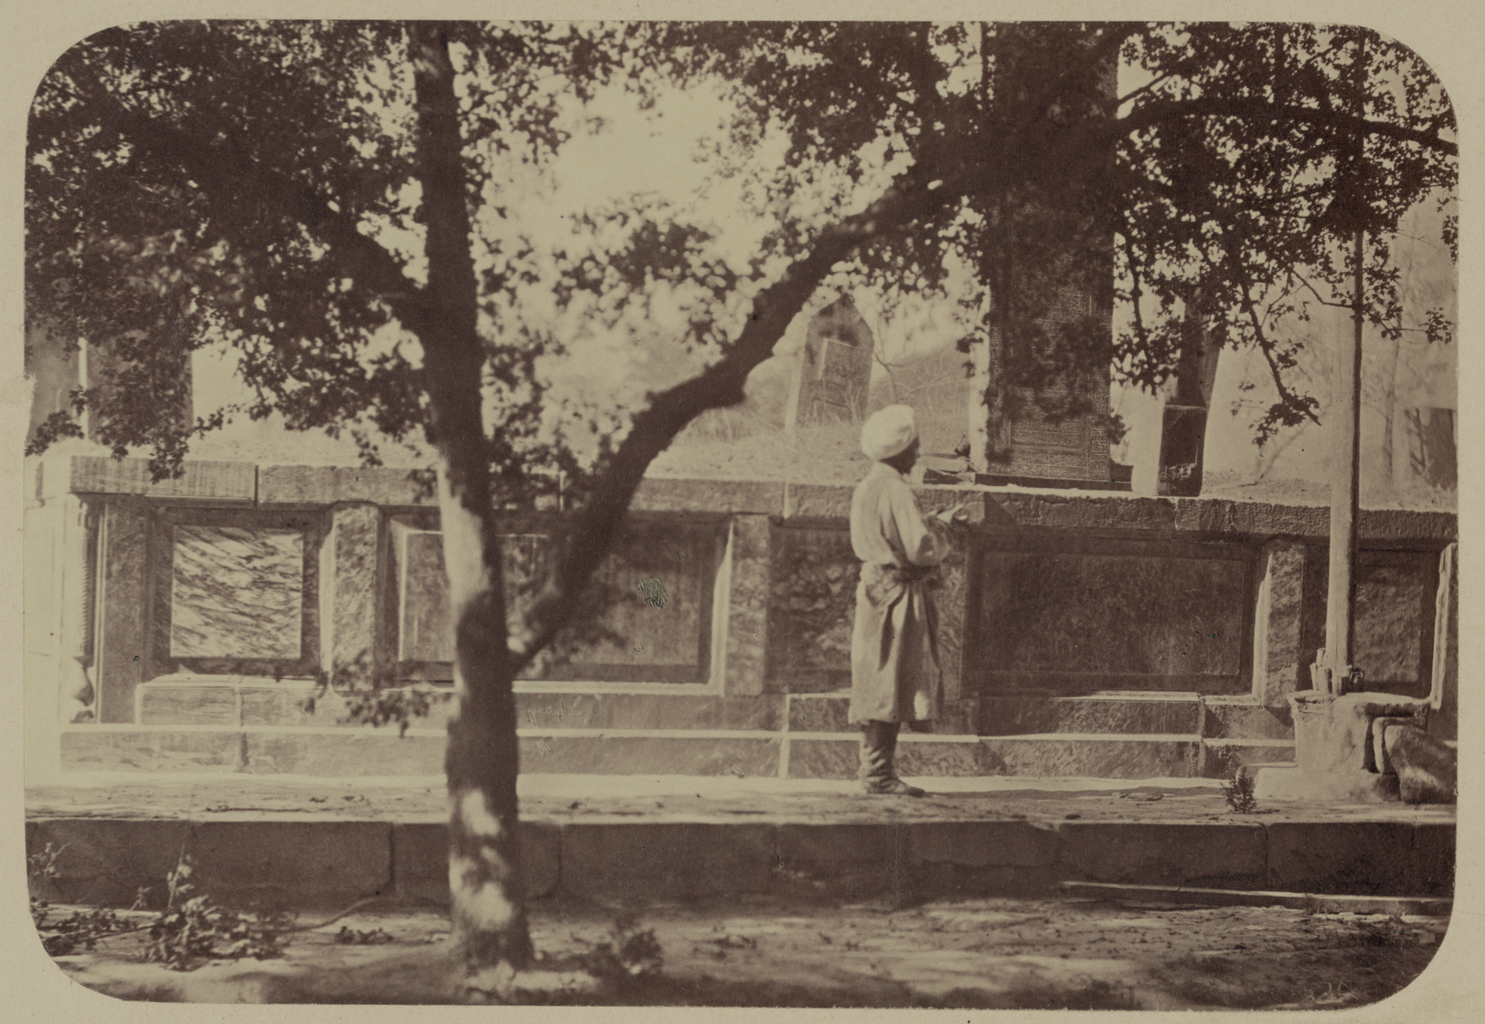 Мечеть Ходжа Ахрар. Фамильное кладбище (сагана) Ходжа Ахрара